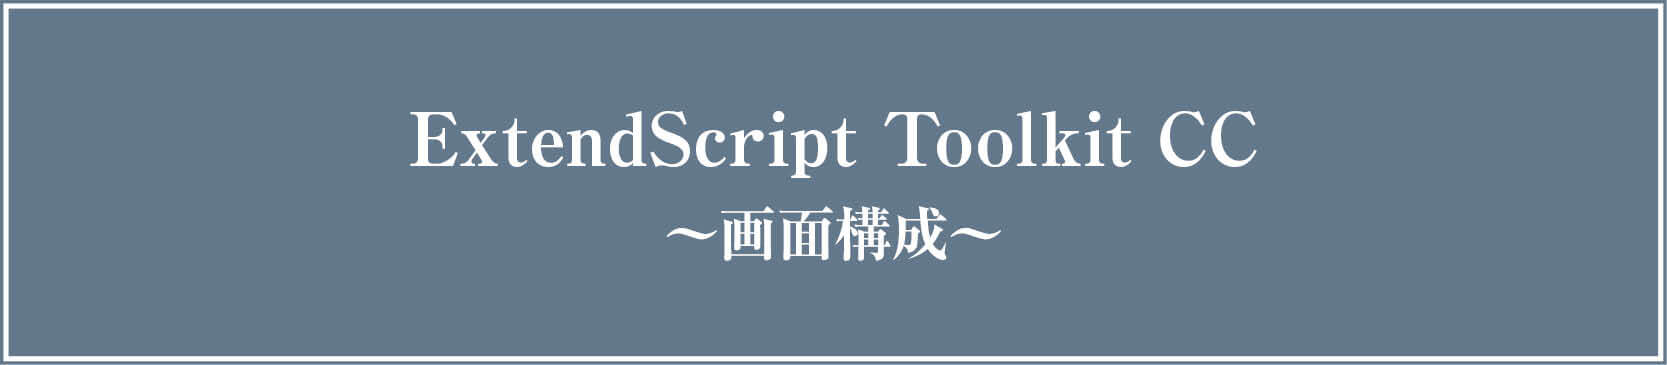 Adobe ExtendScript Toolkit CC 画面構成